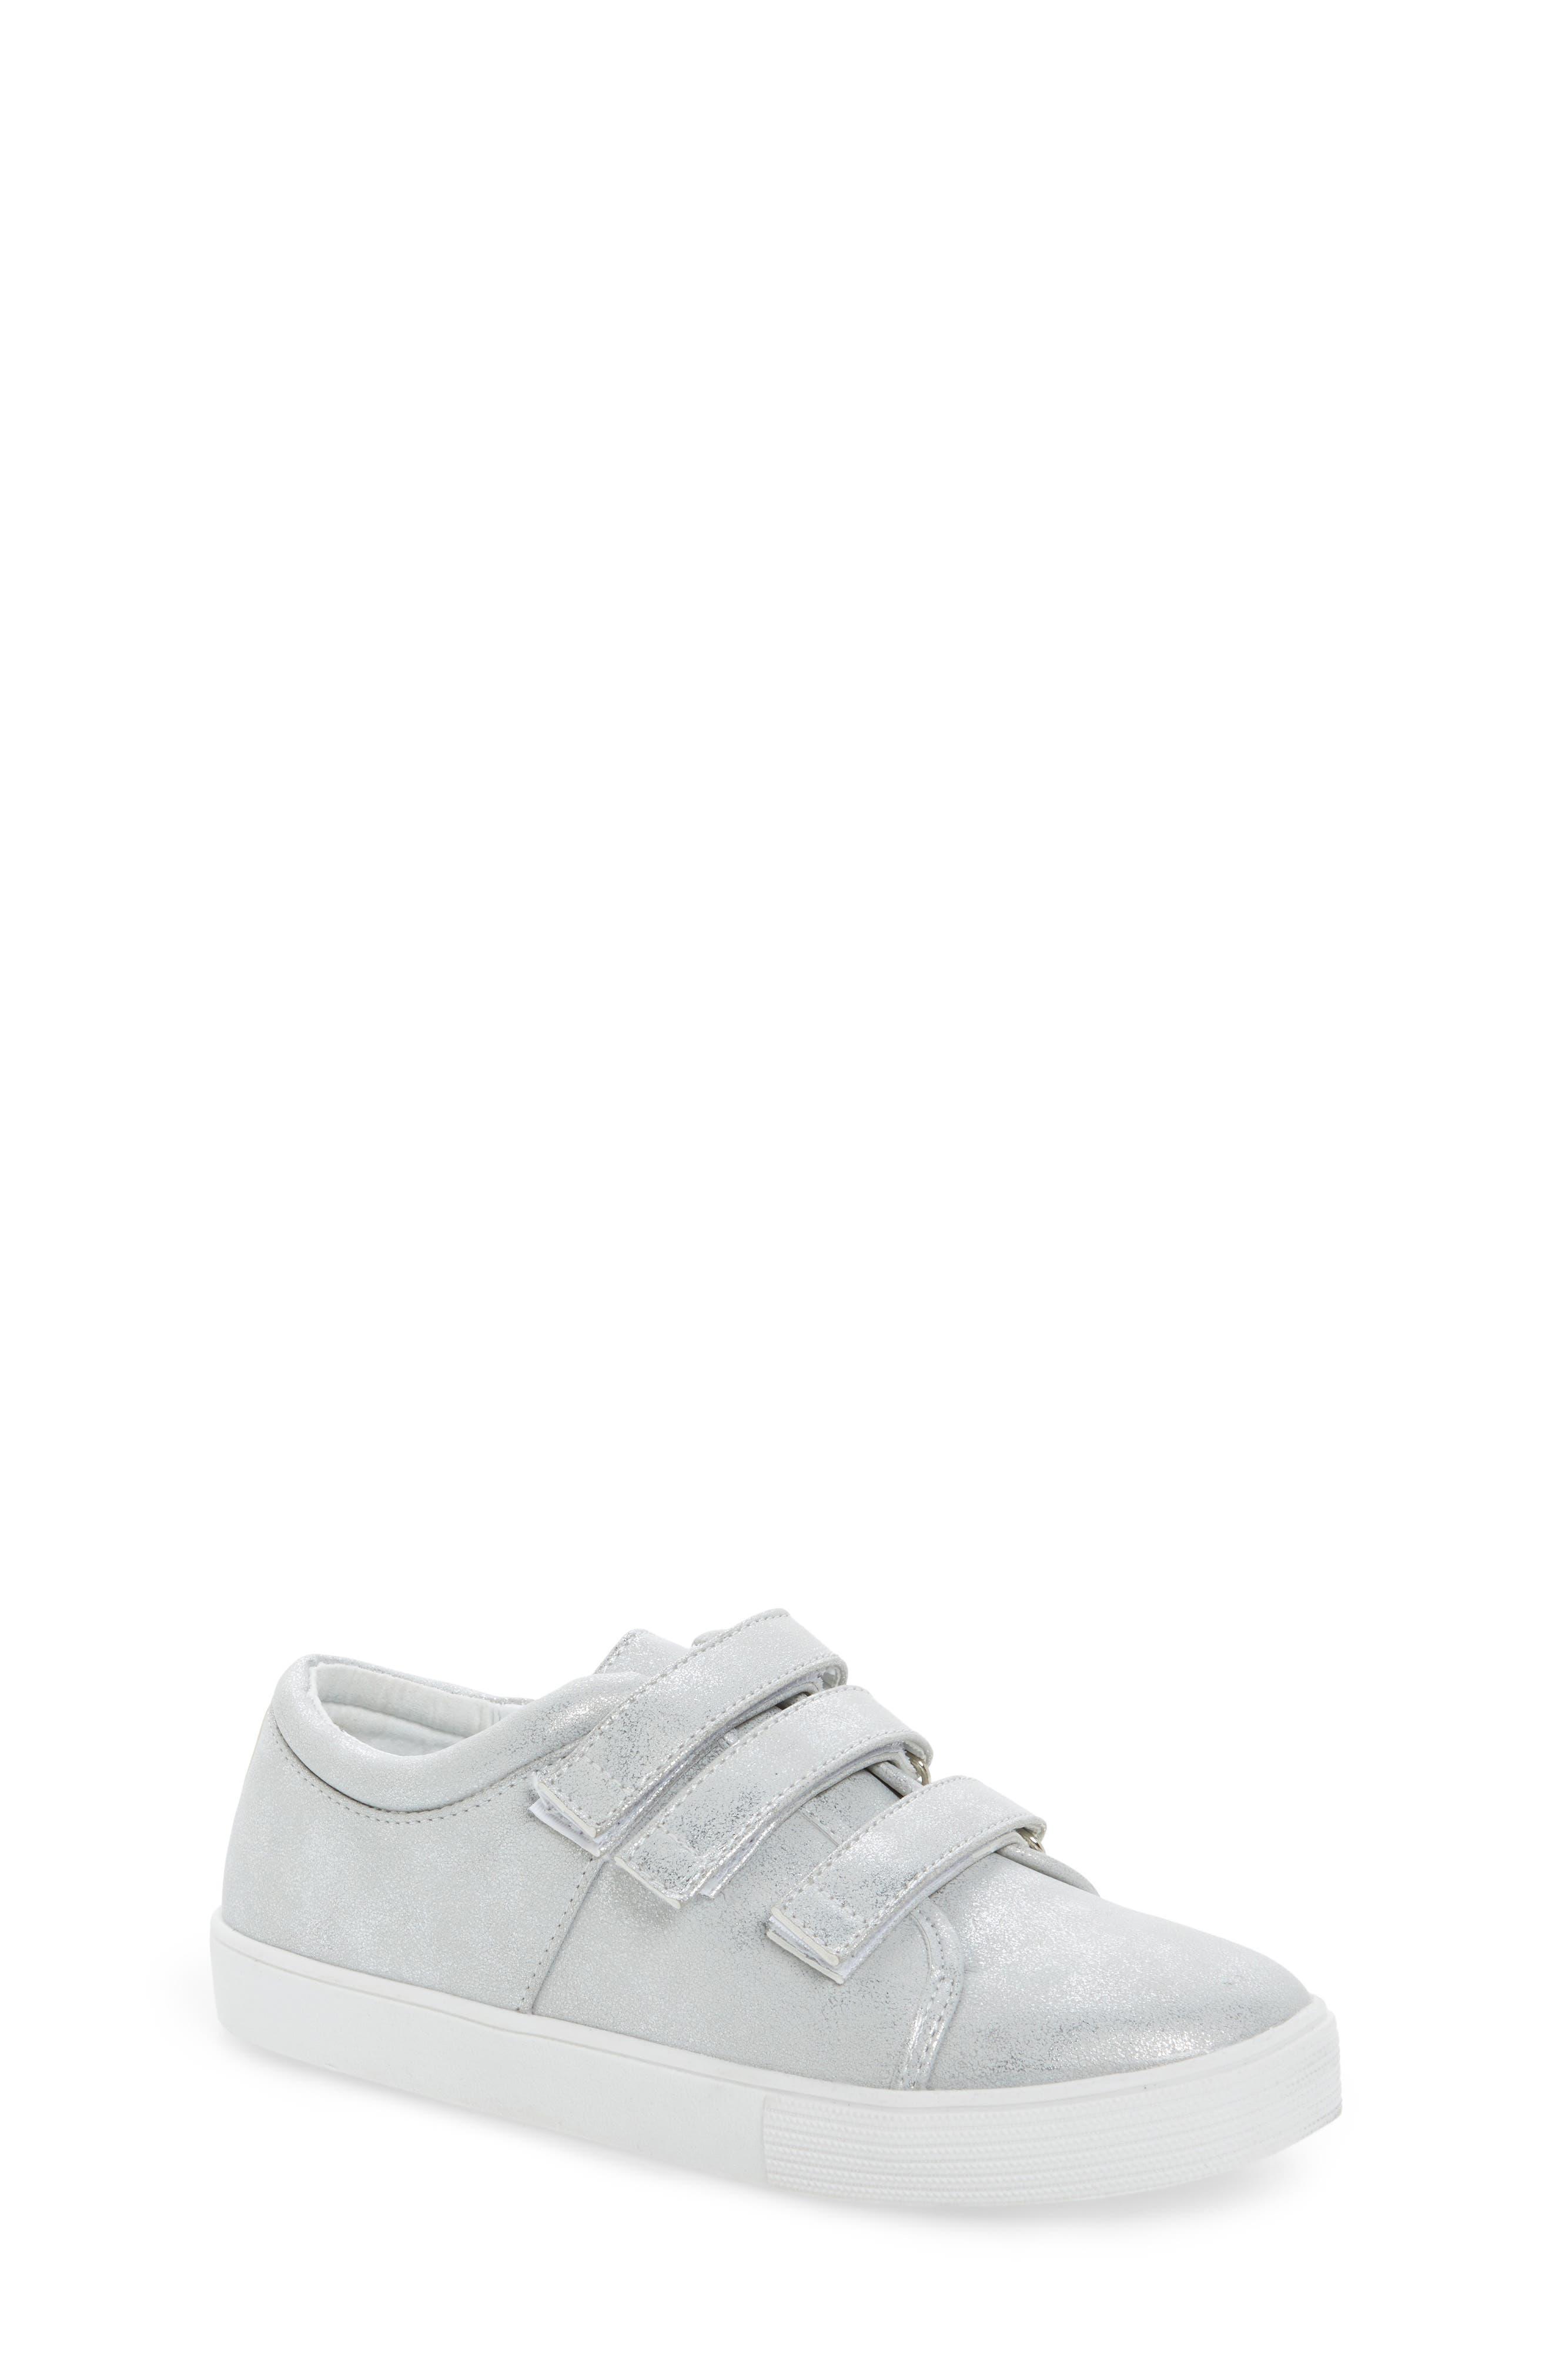 Kam Glitter Strap Sneaker,                         Main,                         color, 040